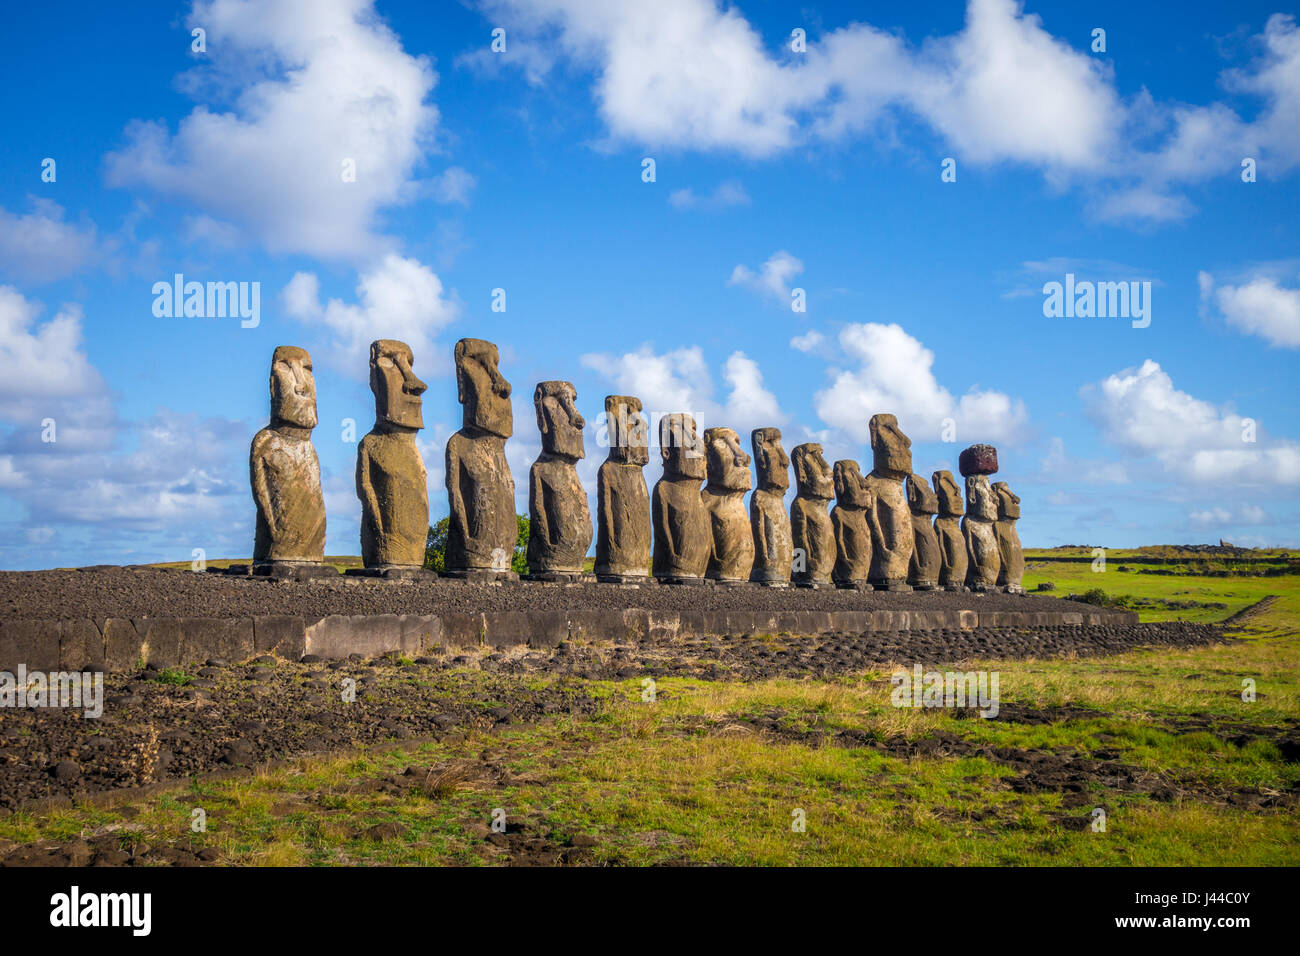 Moais statues, ahu Tongariki, easter island, Chile - Stock Image